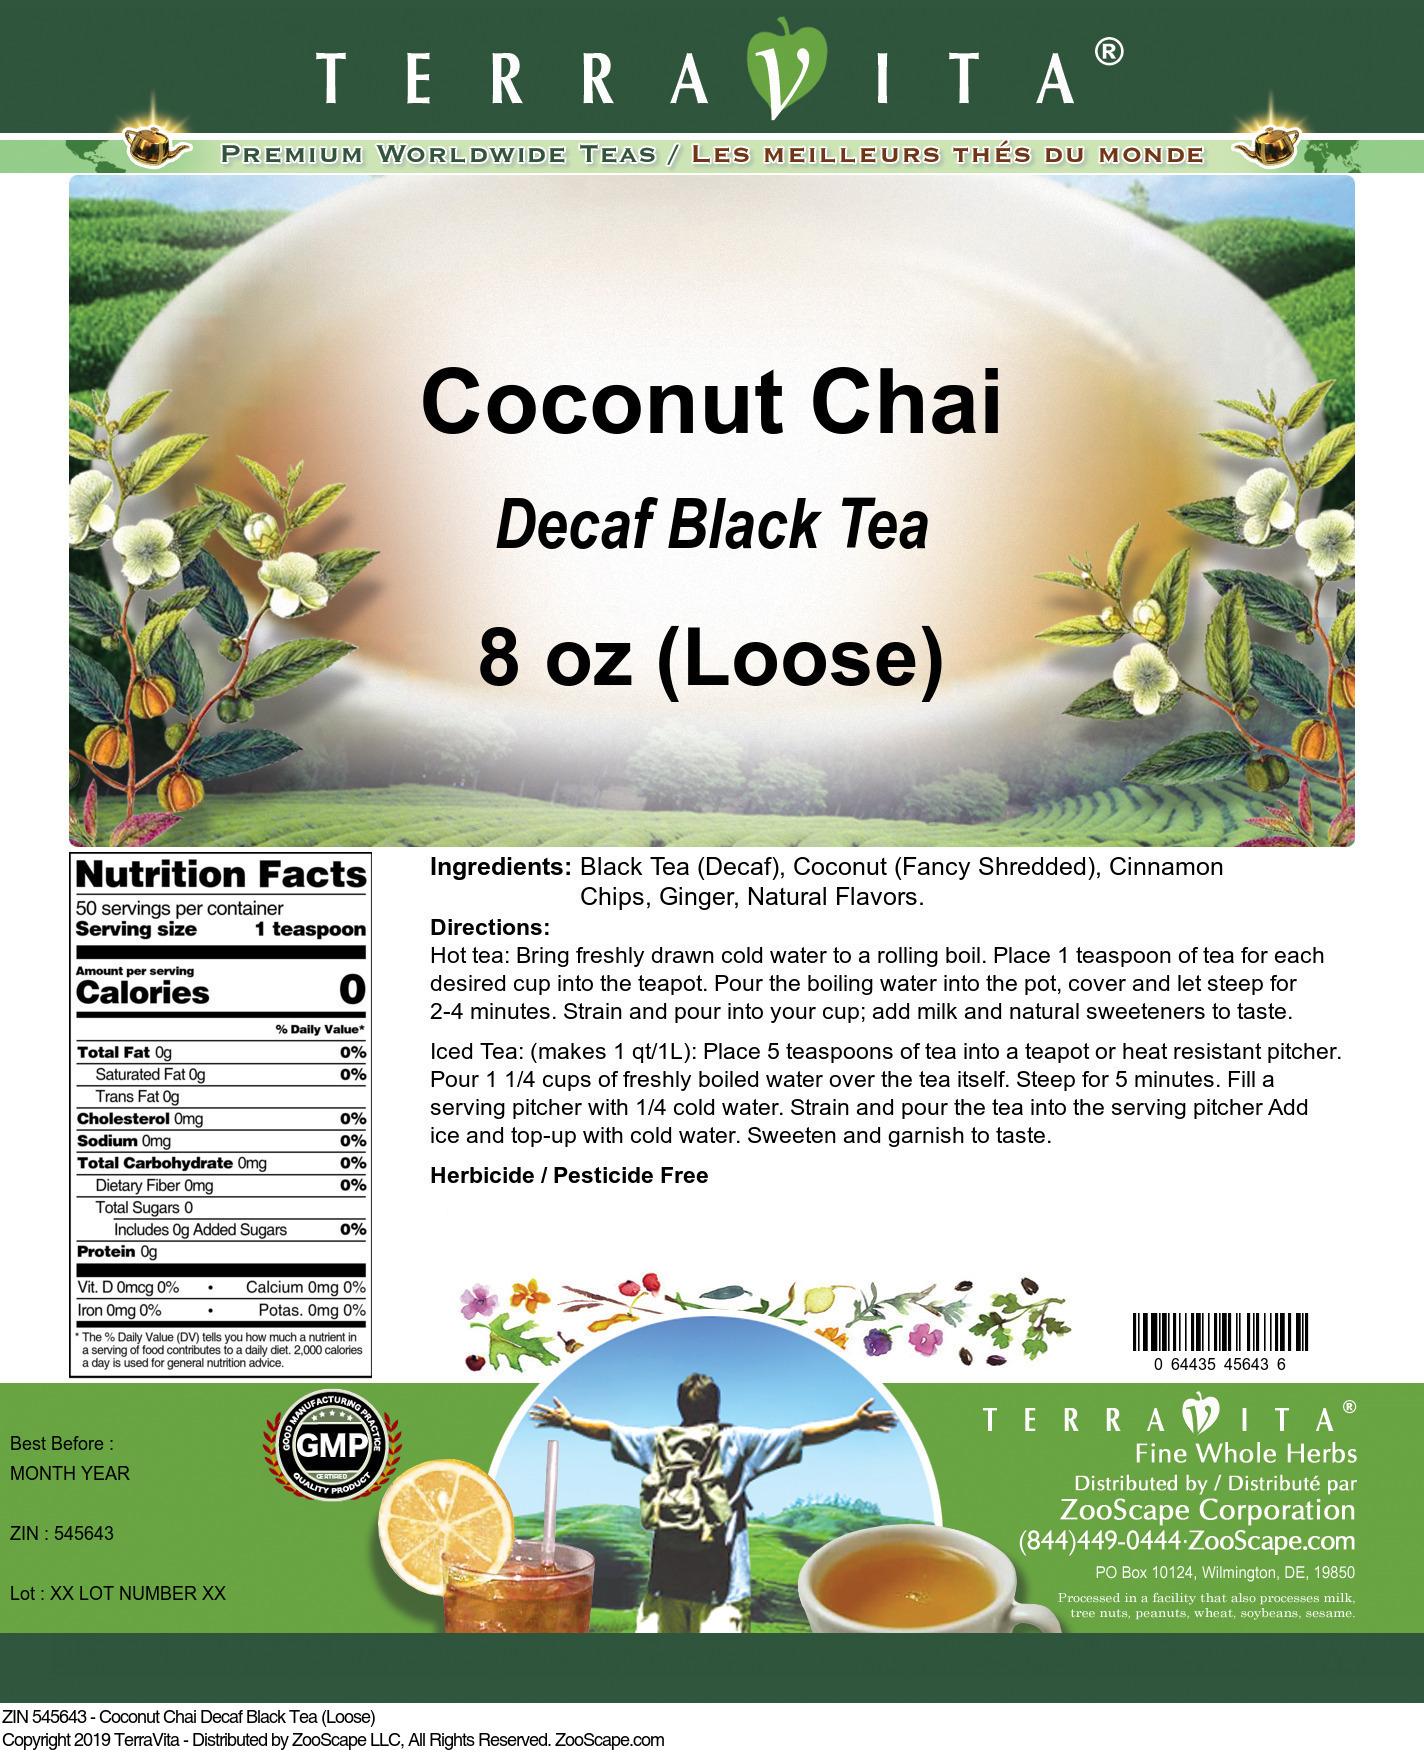 Coconut Chai Decaf Black Tea (Loose)